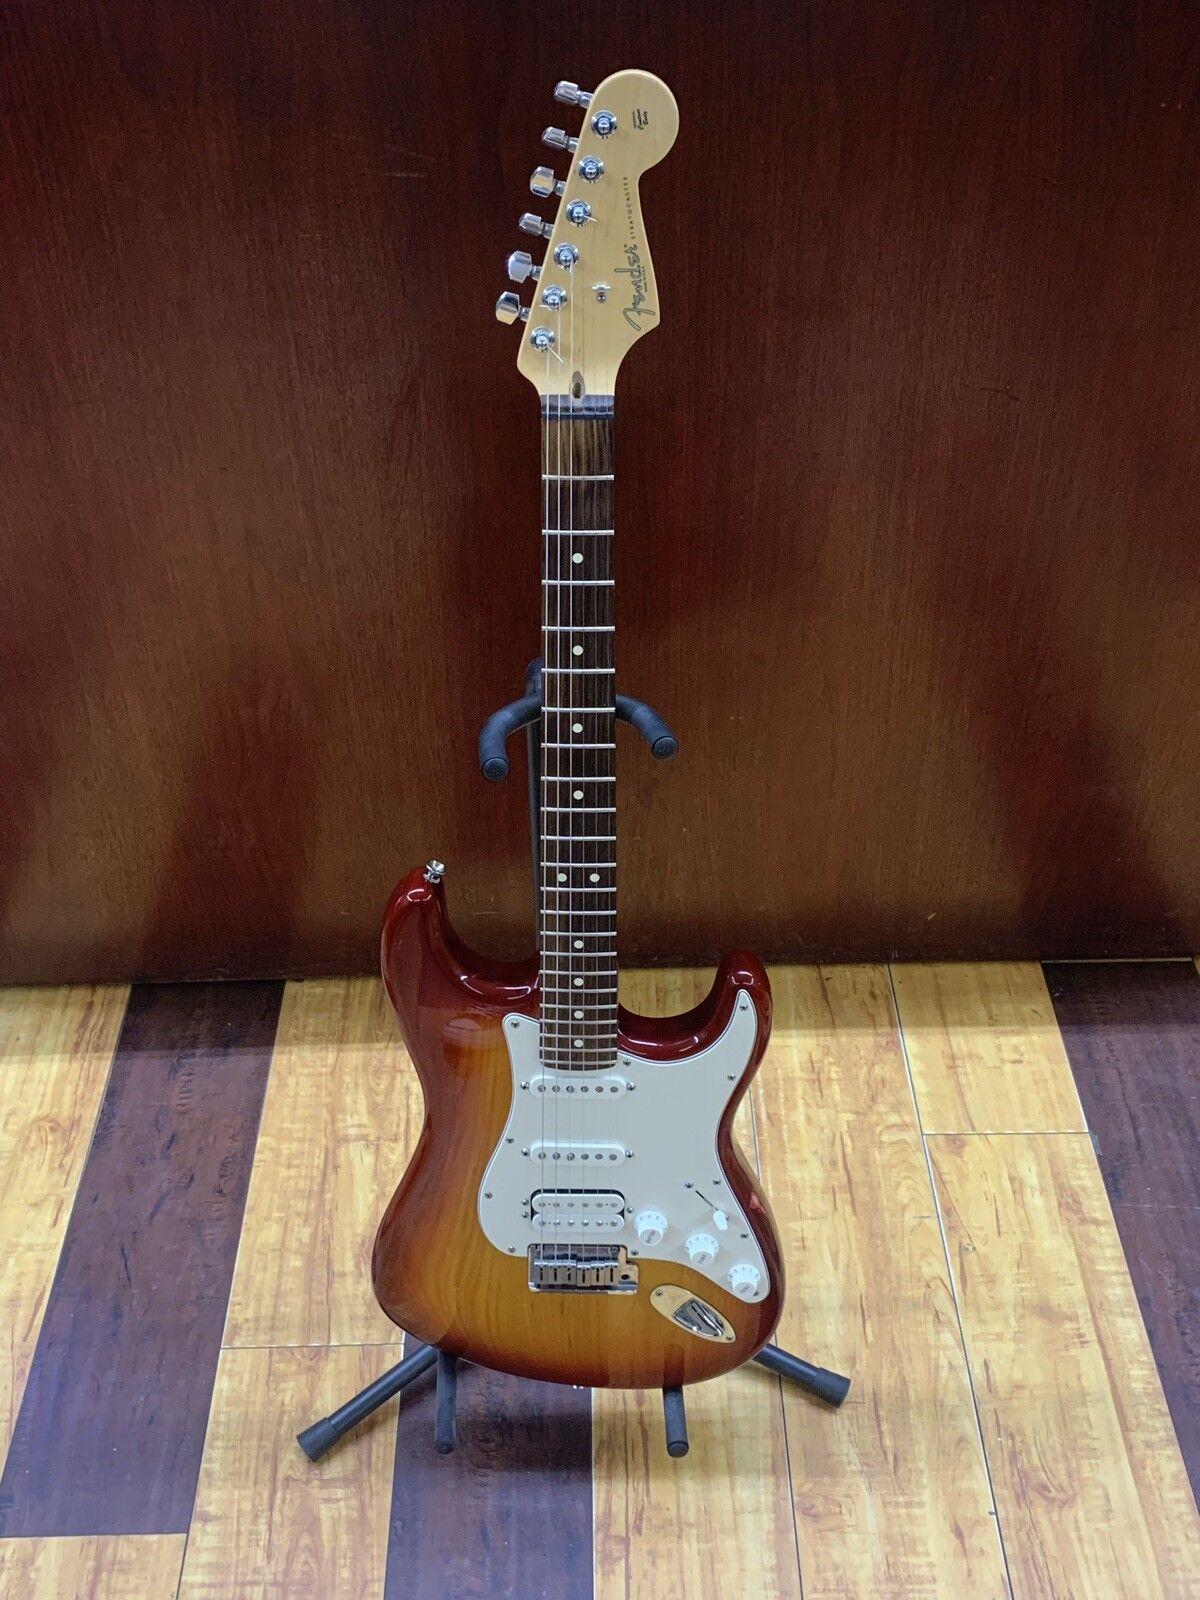 2004 Fender Fender Fender Usa Stratocaster utilizado — lectura —  40% de descuento